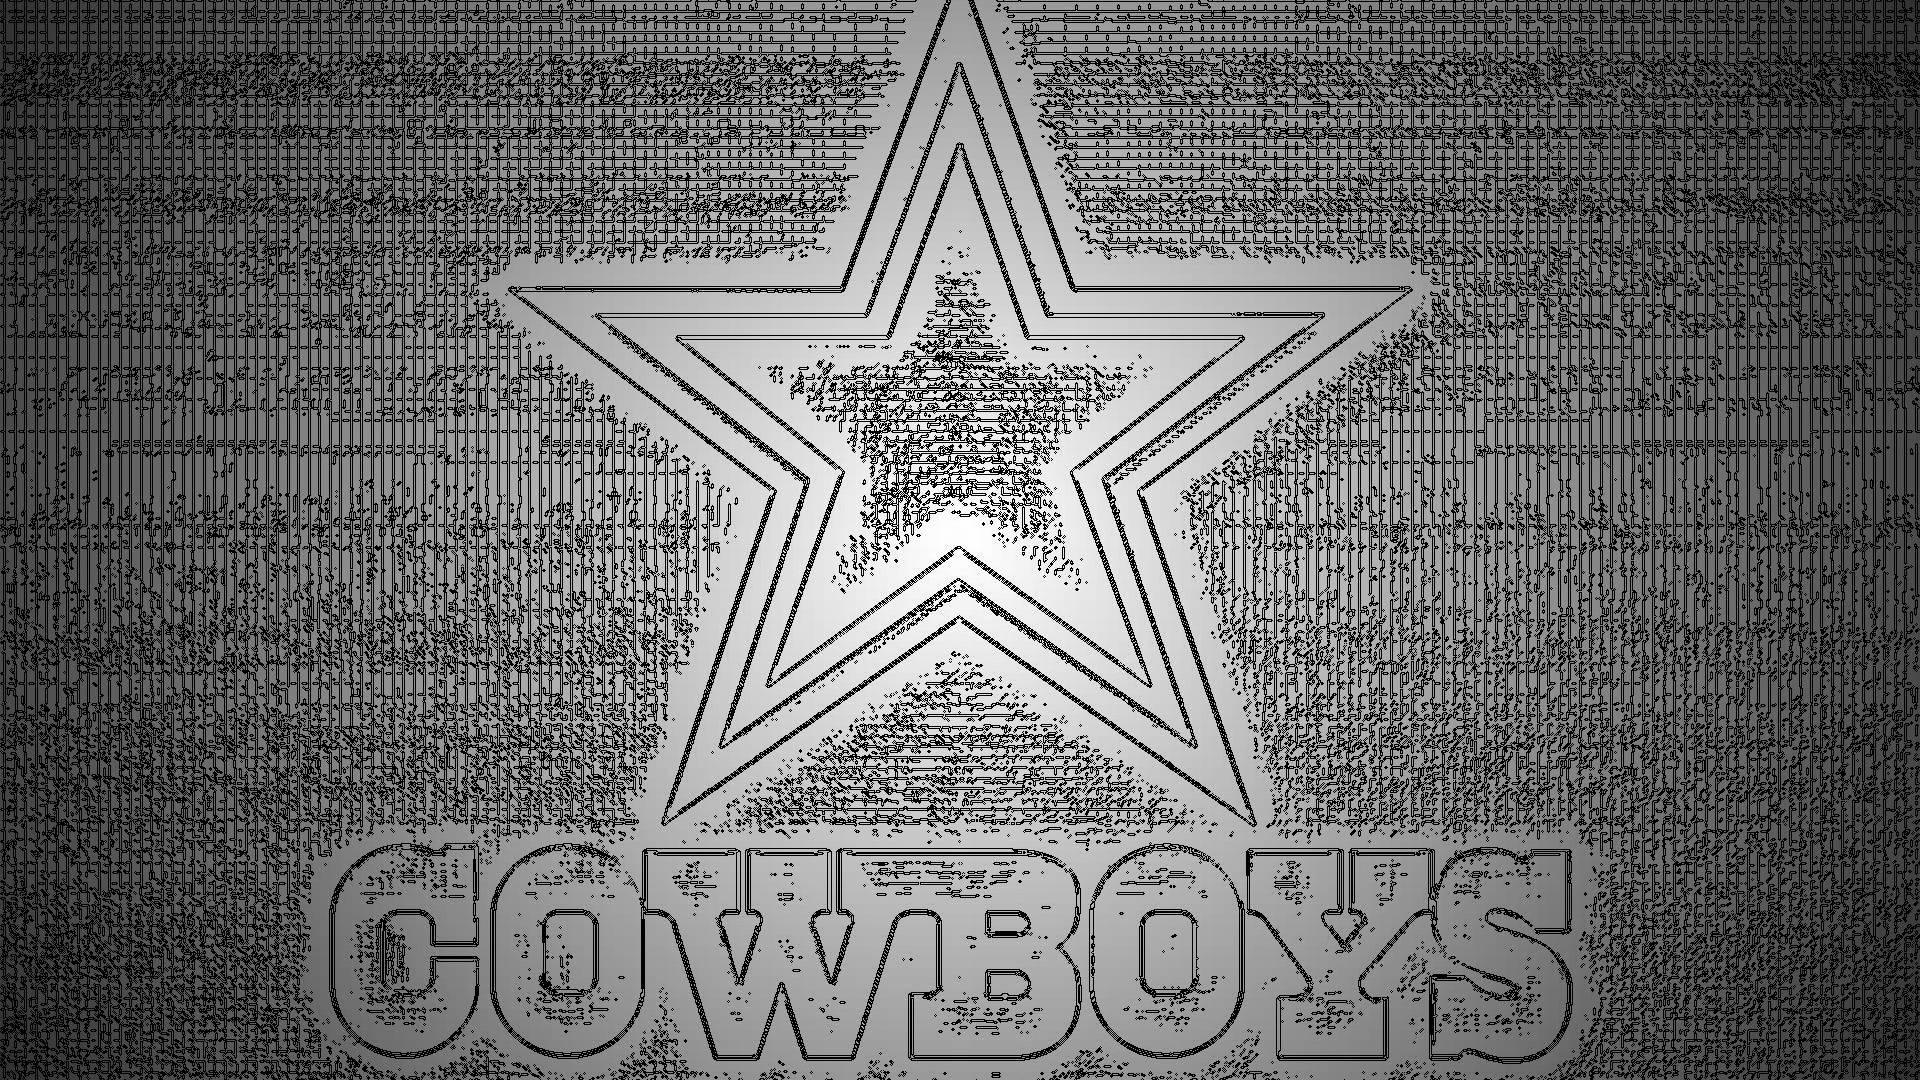 hd wallpaper dallas cowboys for desktop background 1136x640px